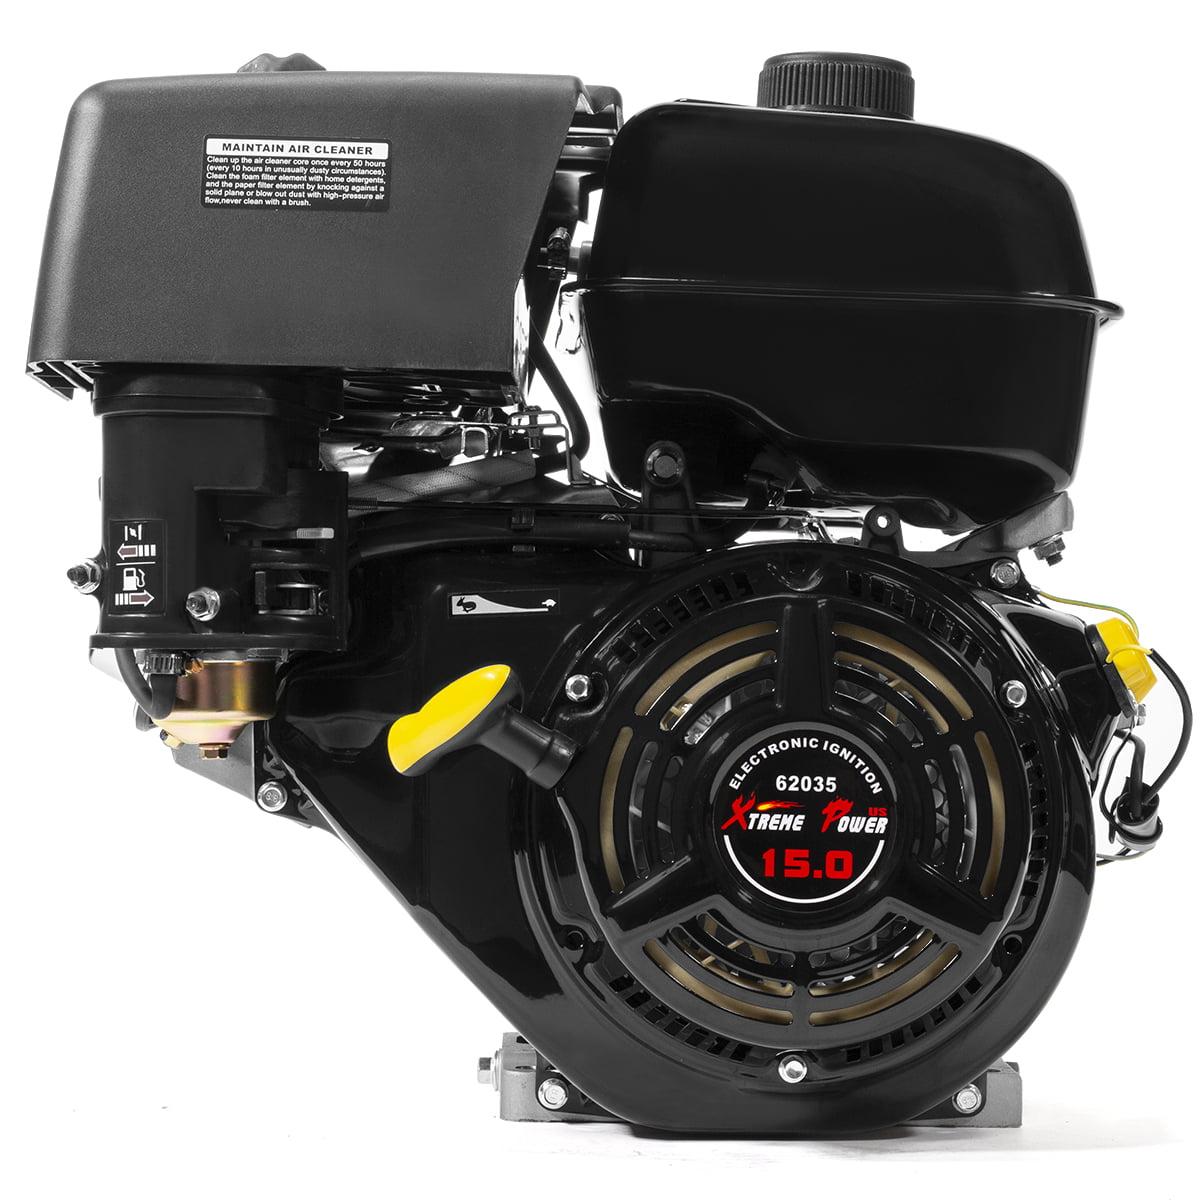 Mowers & Outdoor Power Tools DYRABREST 420CC 15 HP 4 Stroke ...